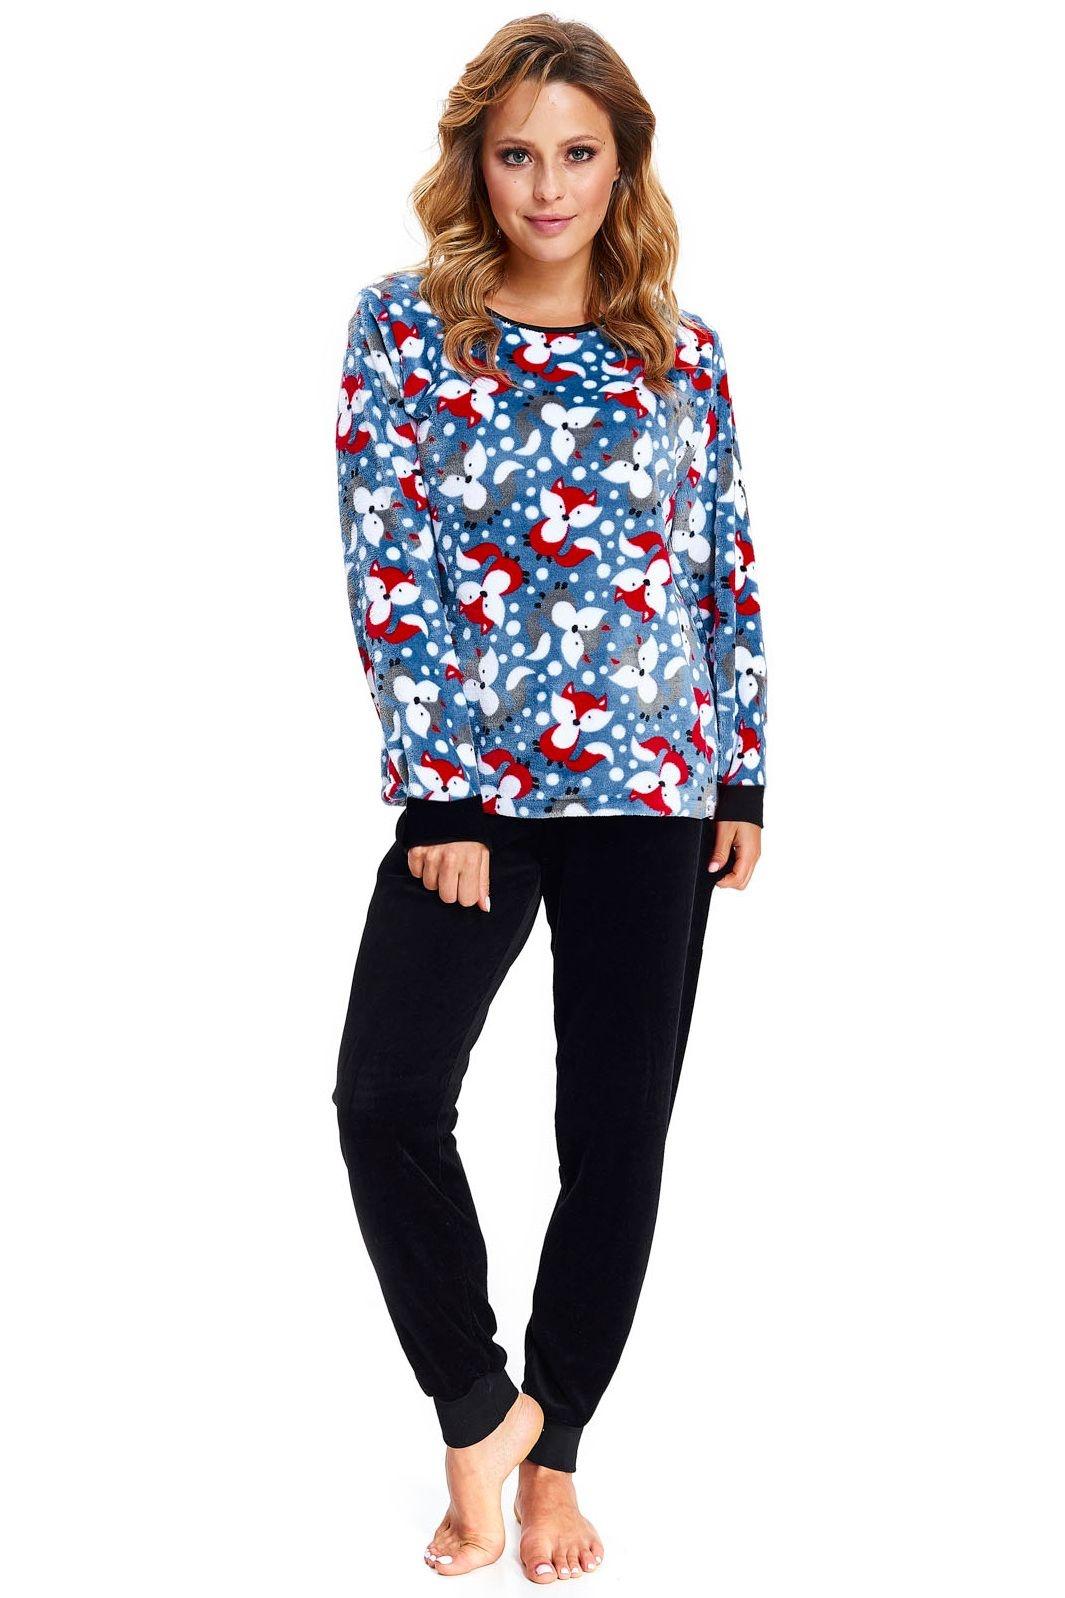 39a06c903fed Dámské soft pyžamo Foxie modré s liškami s dlouhými rukávy